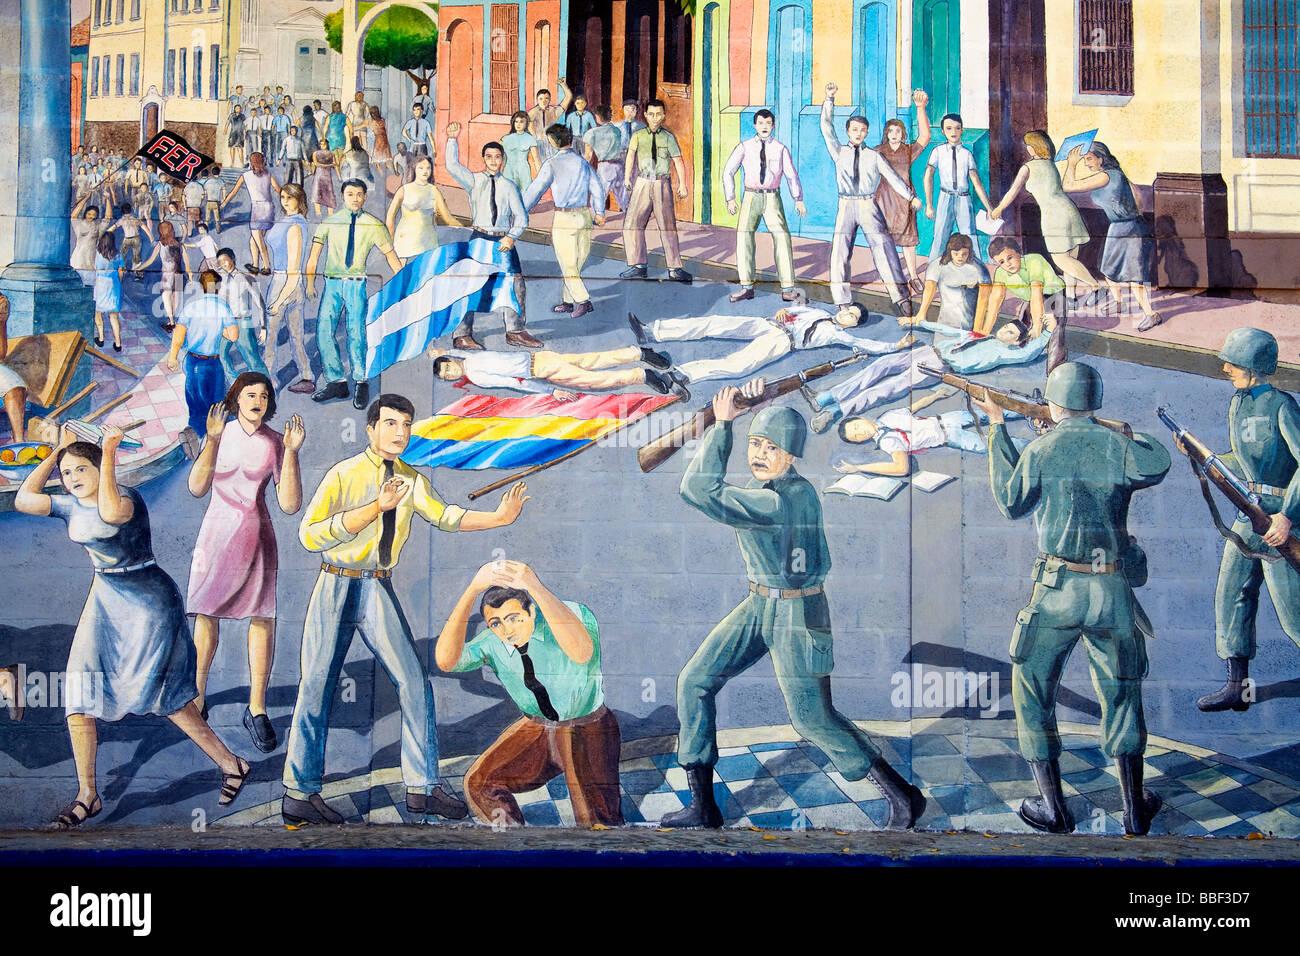 Leon nicaragua central america civil war mural stock for Mural nicaraguense